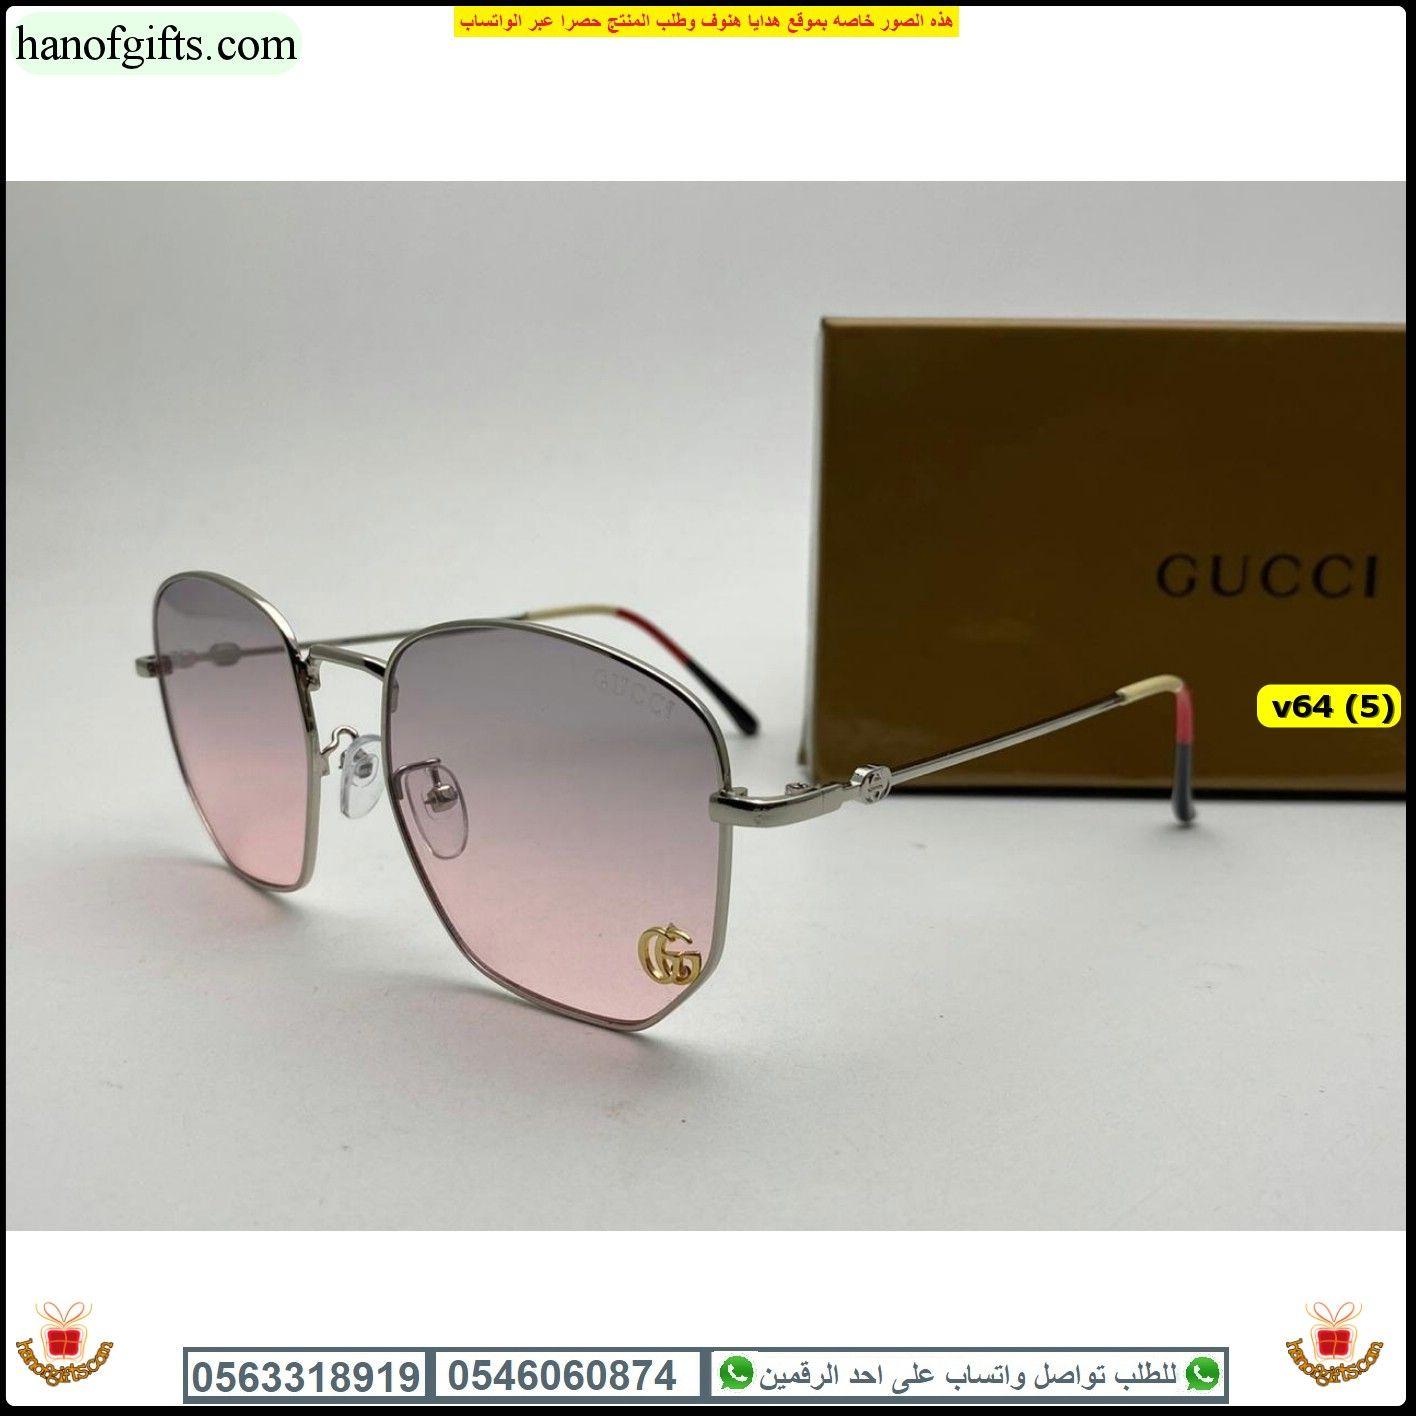 نظارة قوتشي 2020 افخم الموديلات اليوم مع ملحقاتها Gucci Glasses هدايا هنوف Glasses Sunglasses